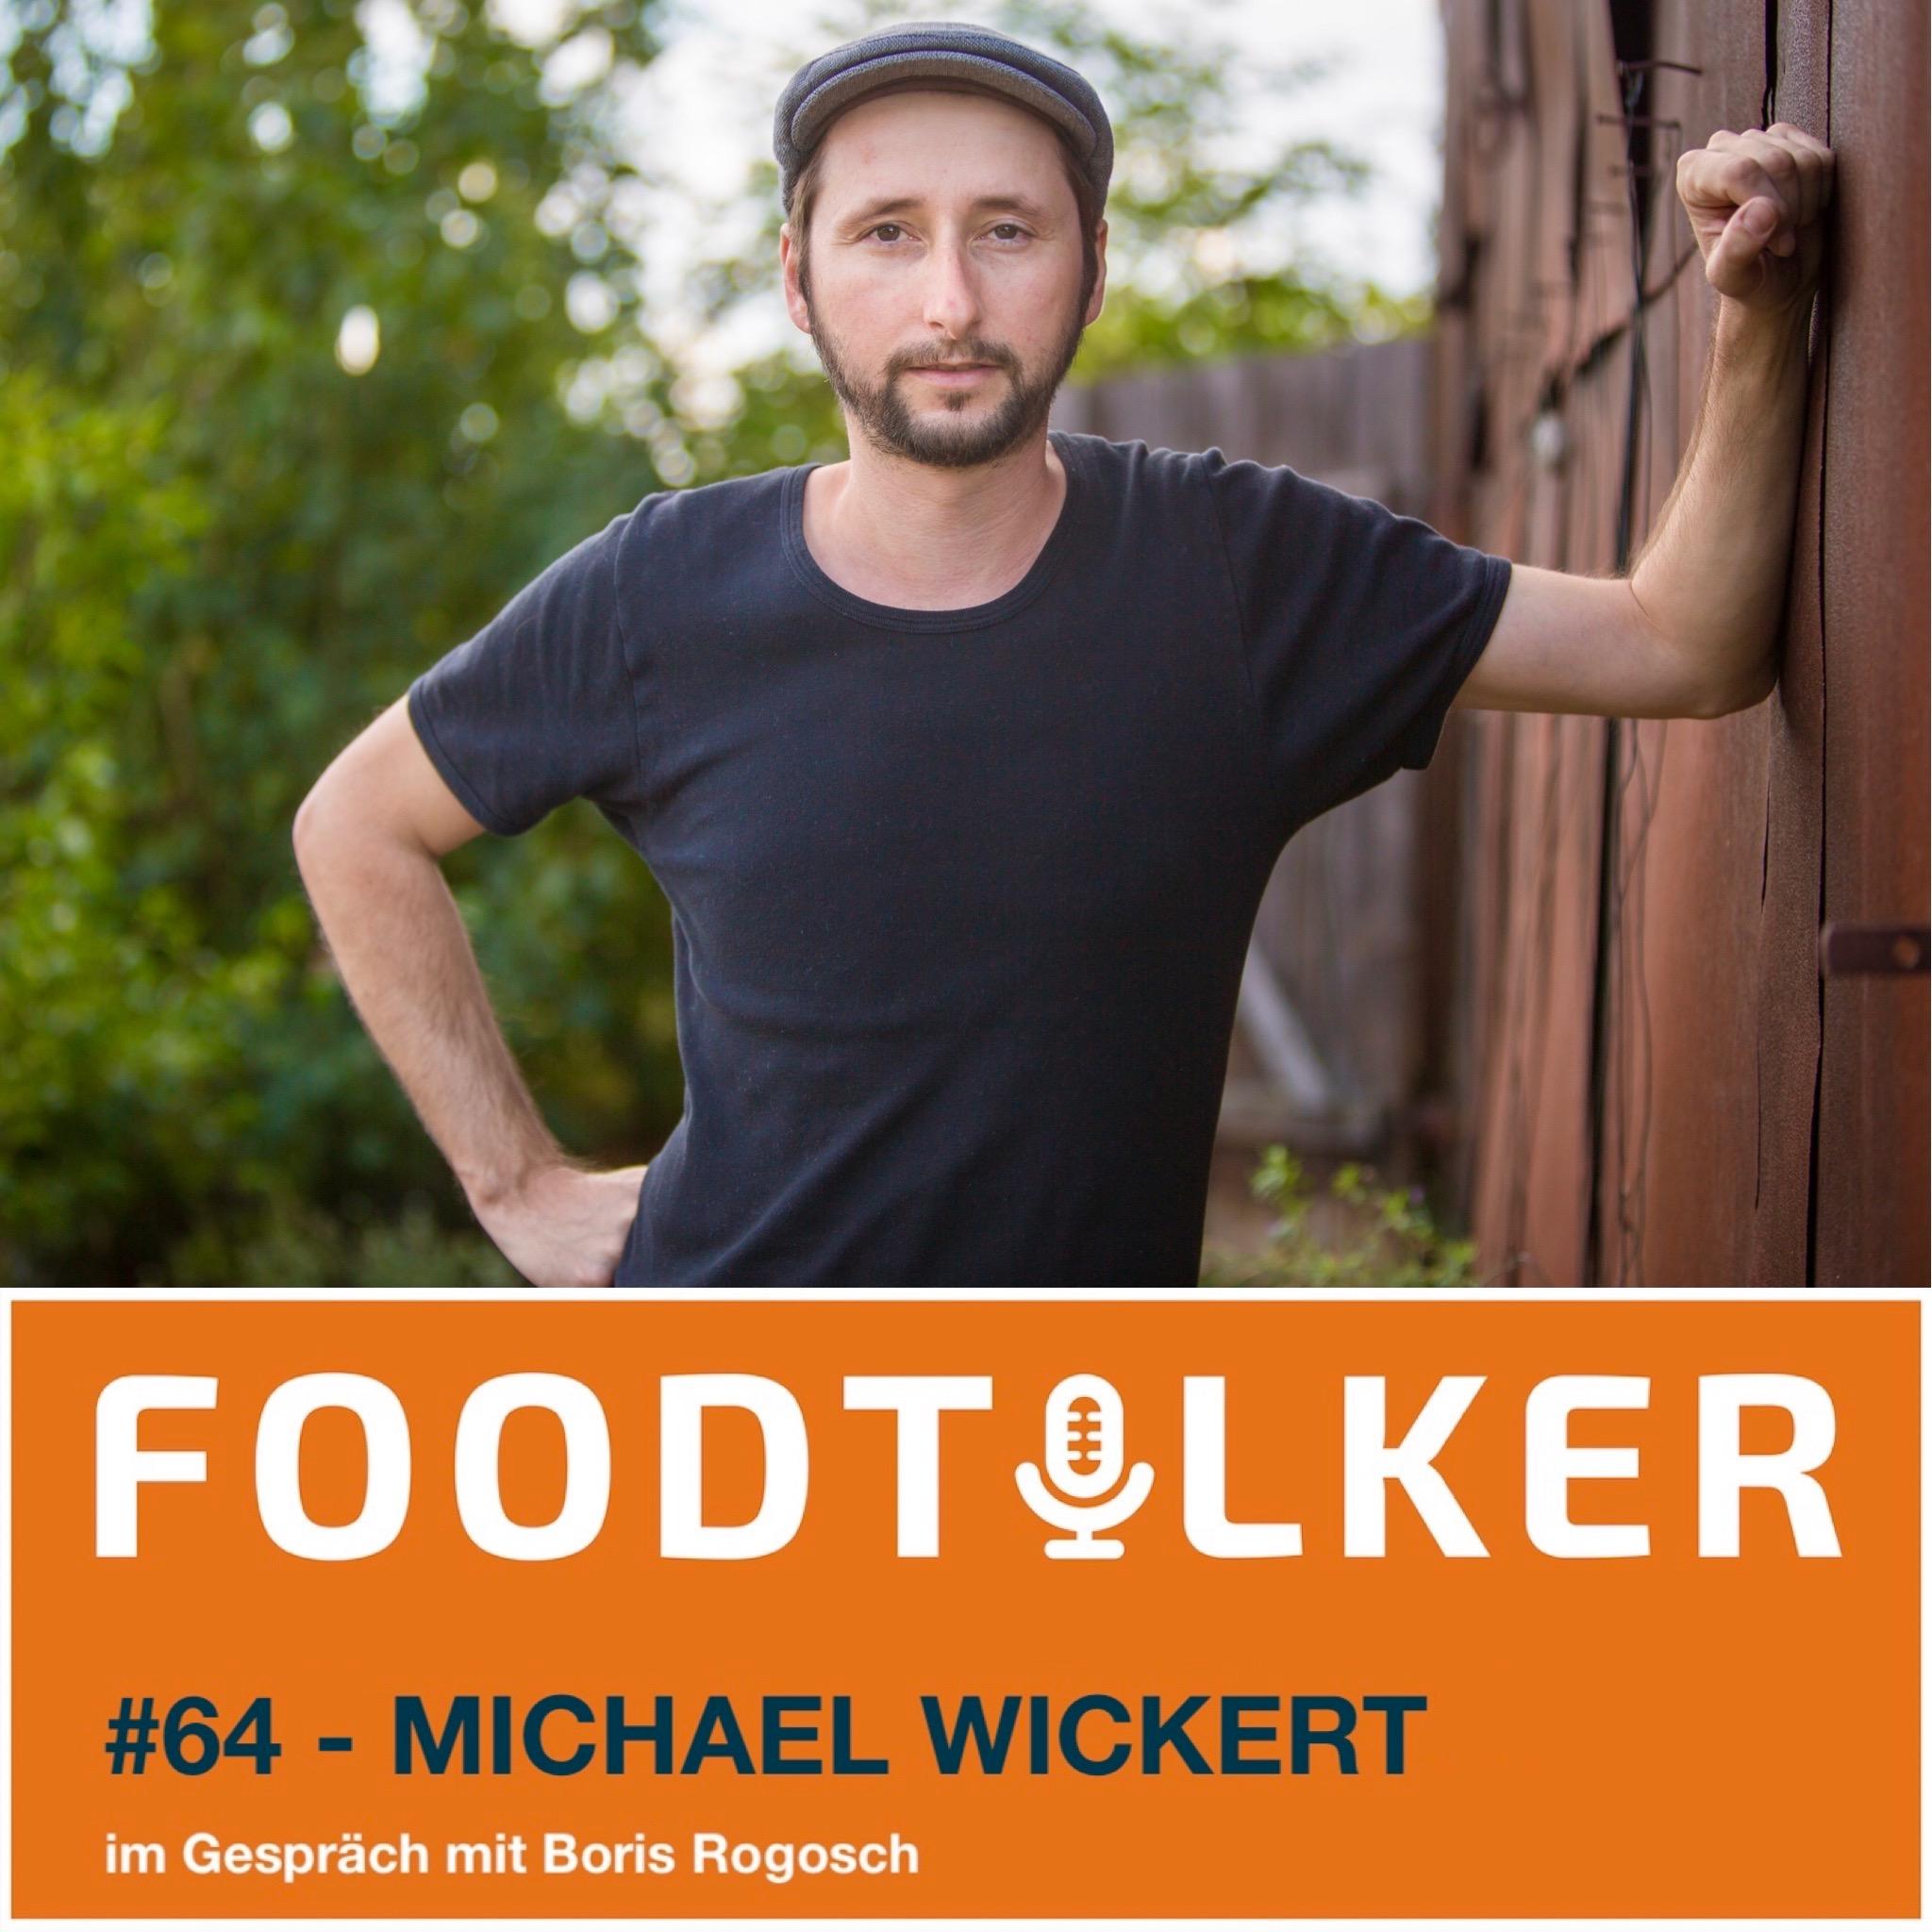 Michael Wickert - Glut & Späne**